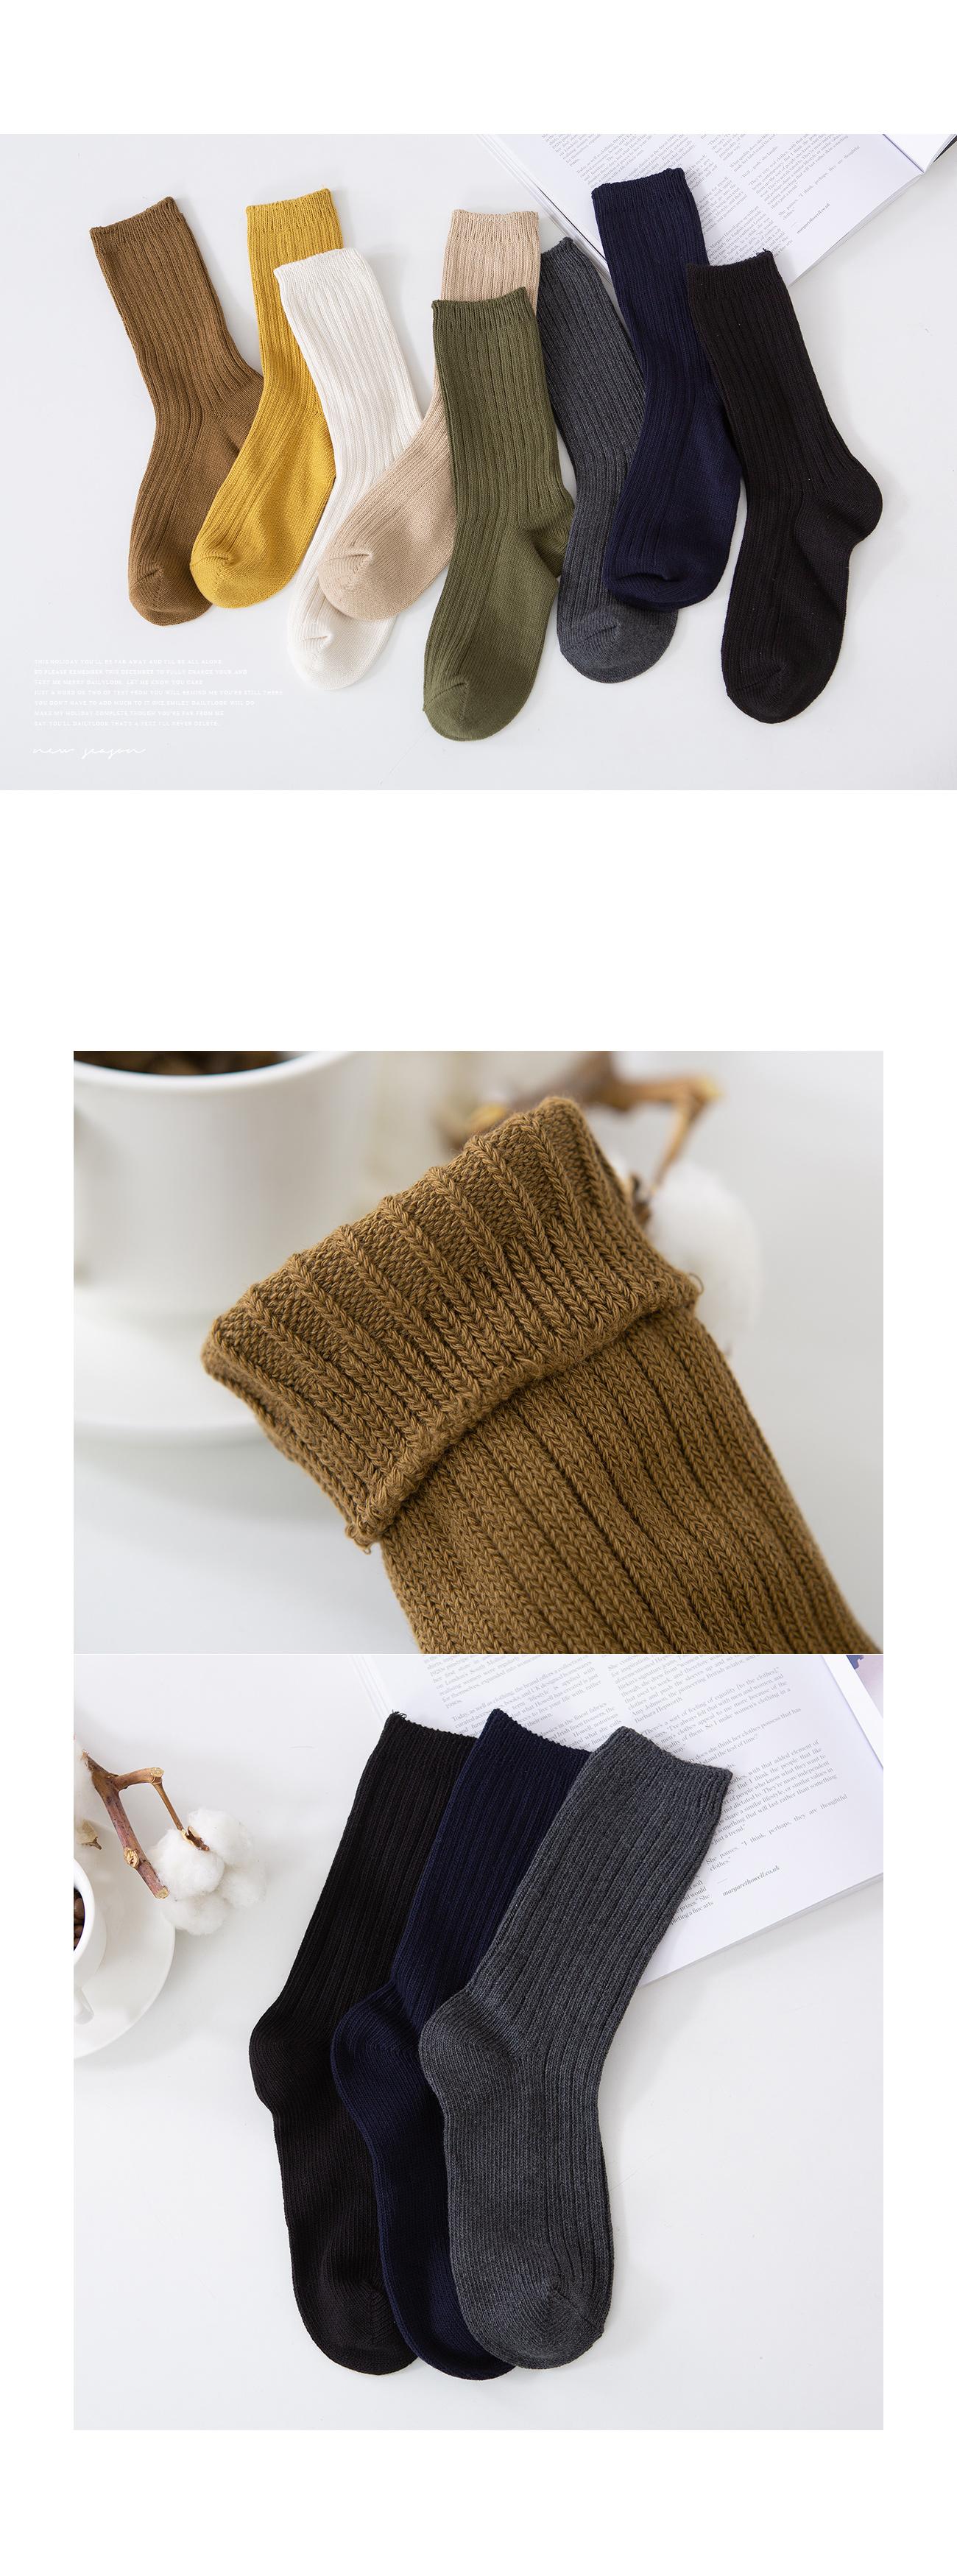 Ribbed winter socks # 85549